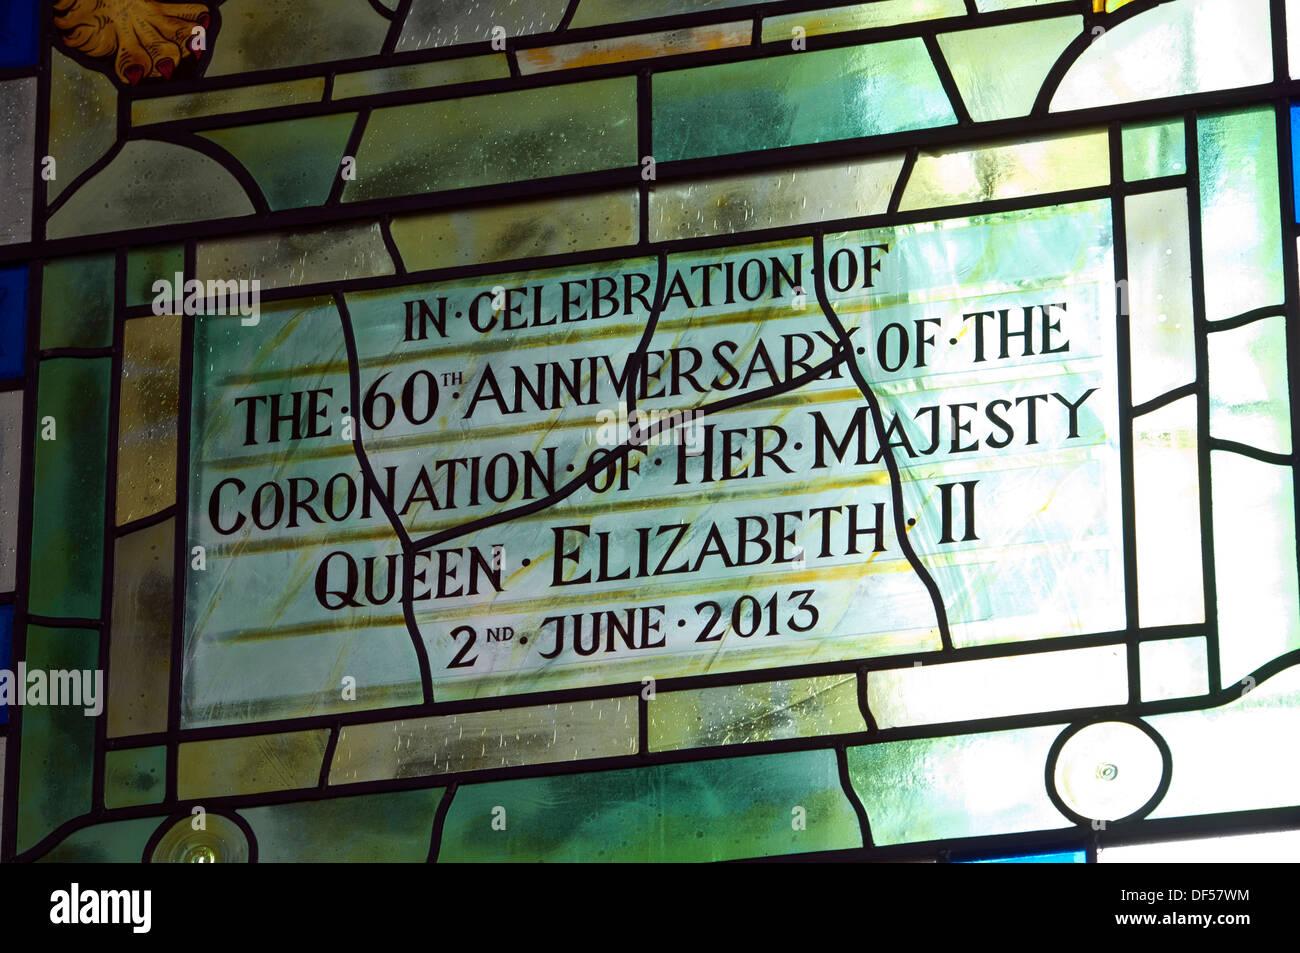 Diamond Jubilee stained glass detail, St. Mary Magdalene Church, Bridgnorth, Shropshire, England, UK - Stock Image